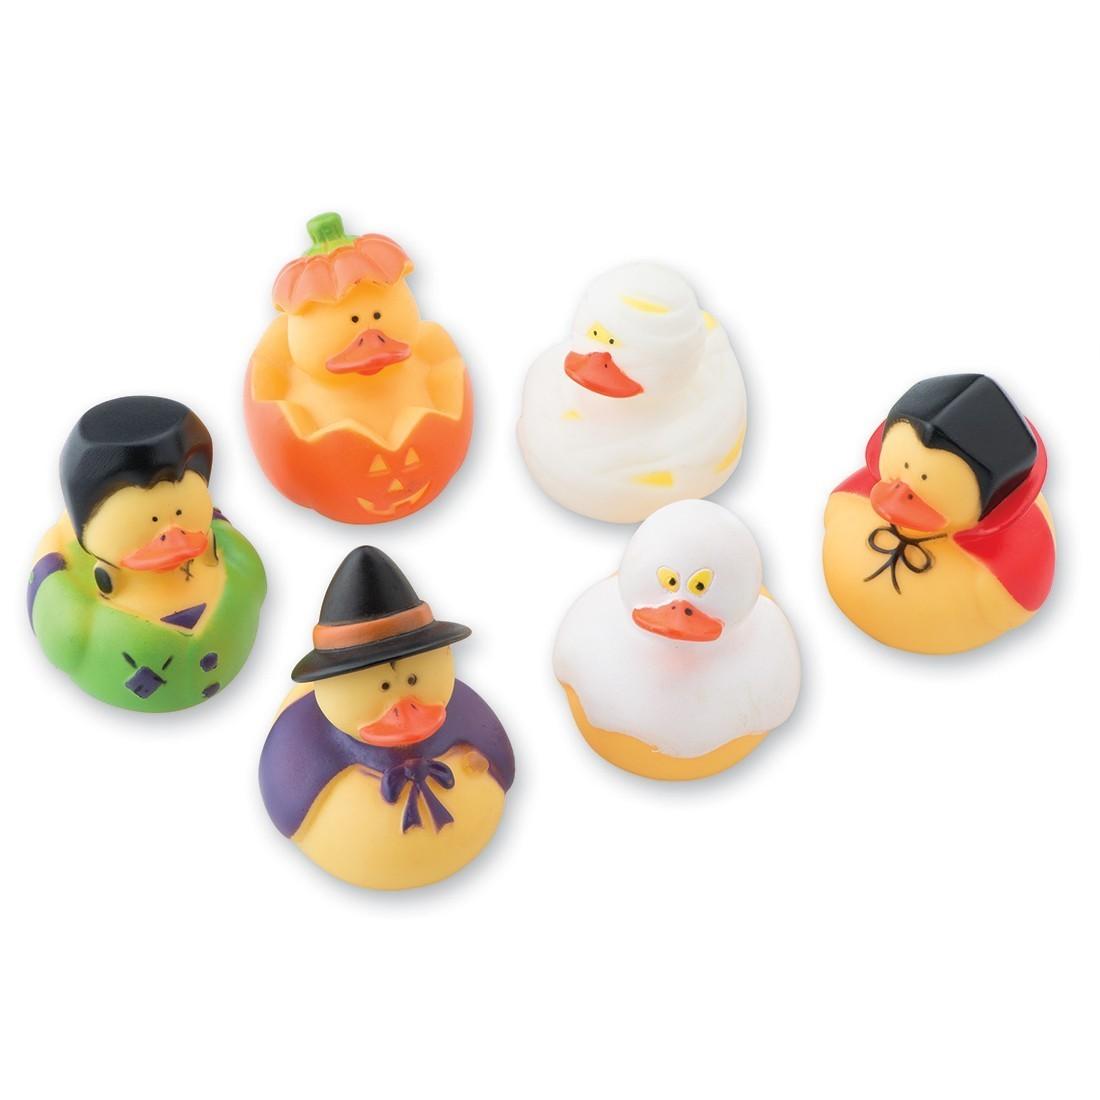 Halloween Rubber Ducks [image]